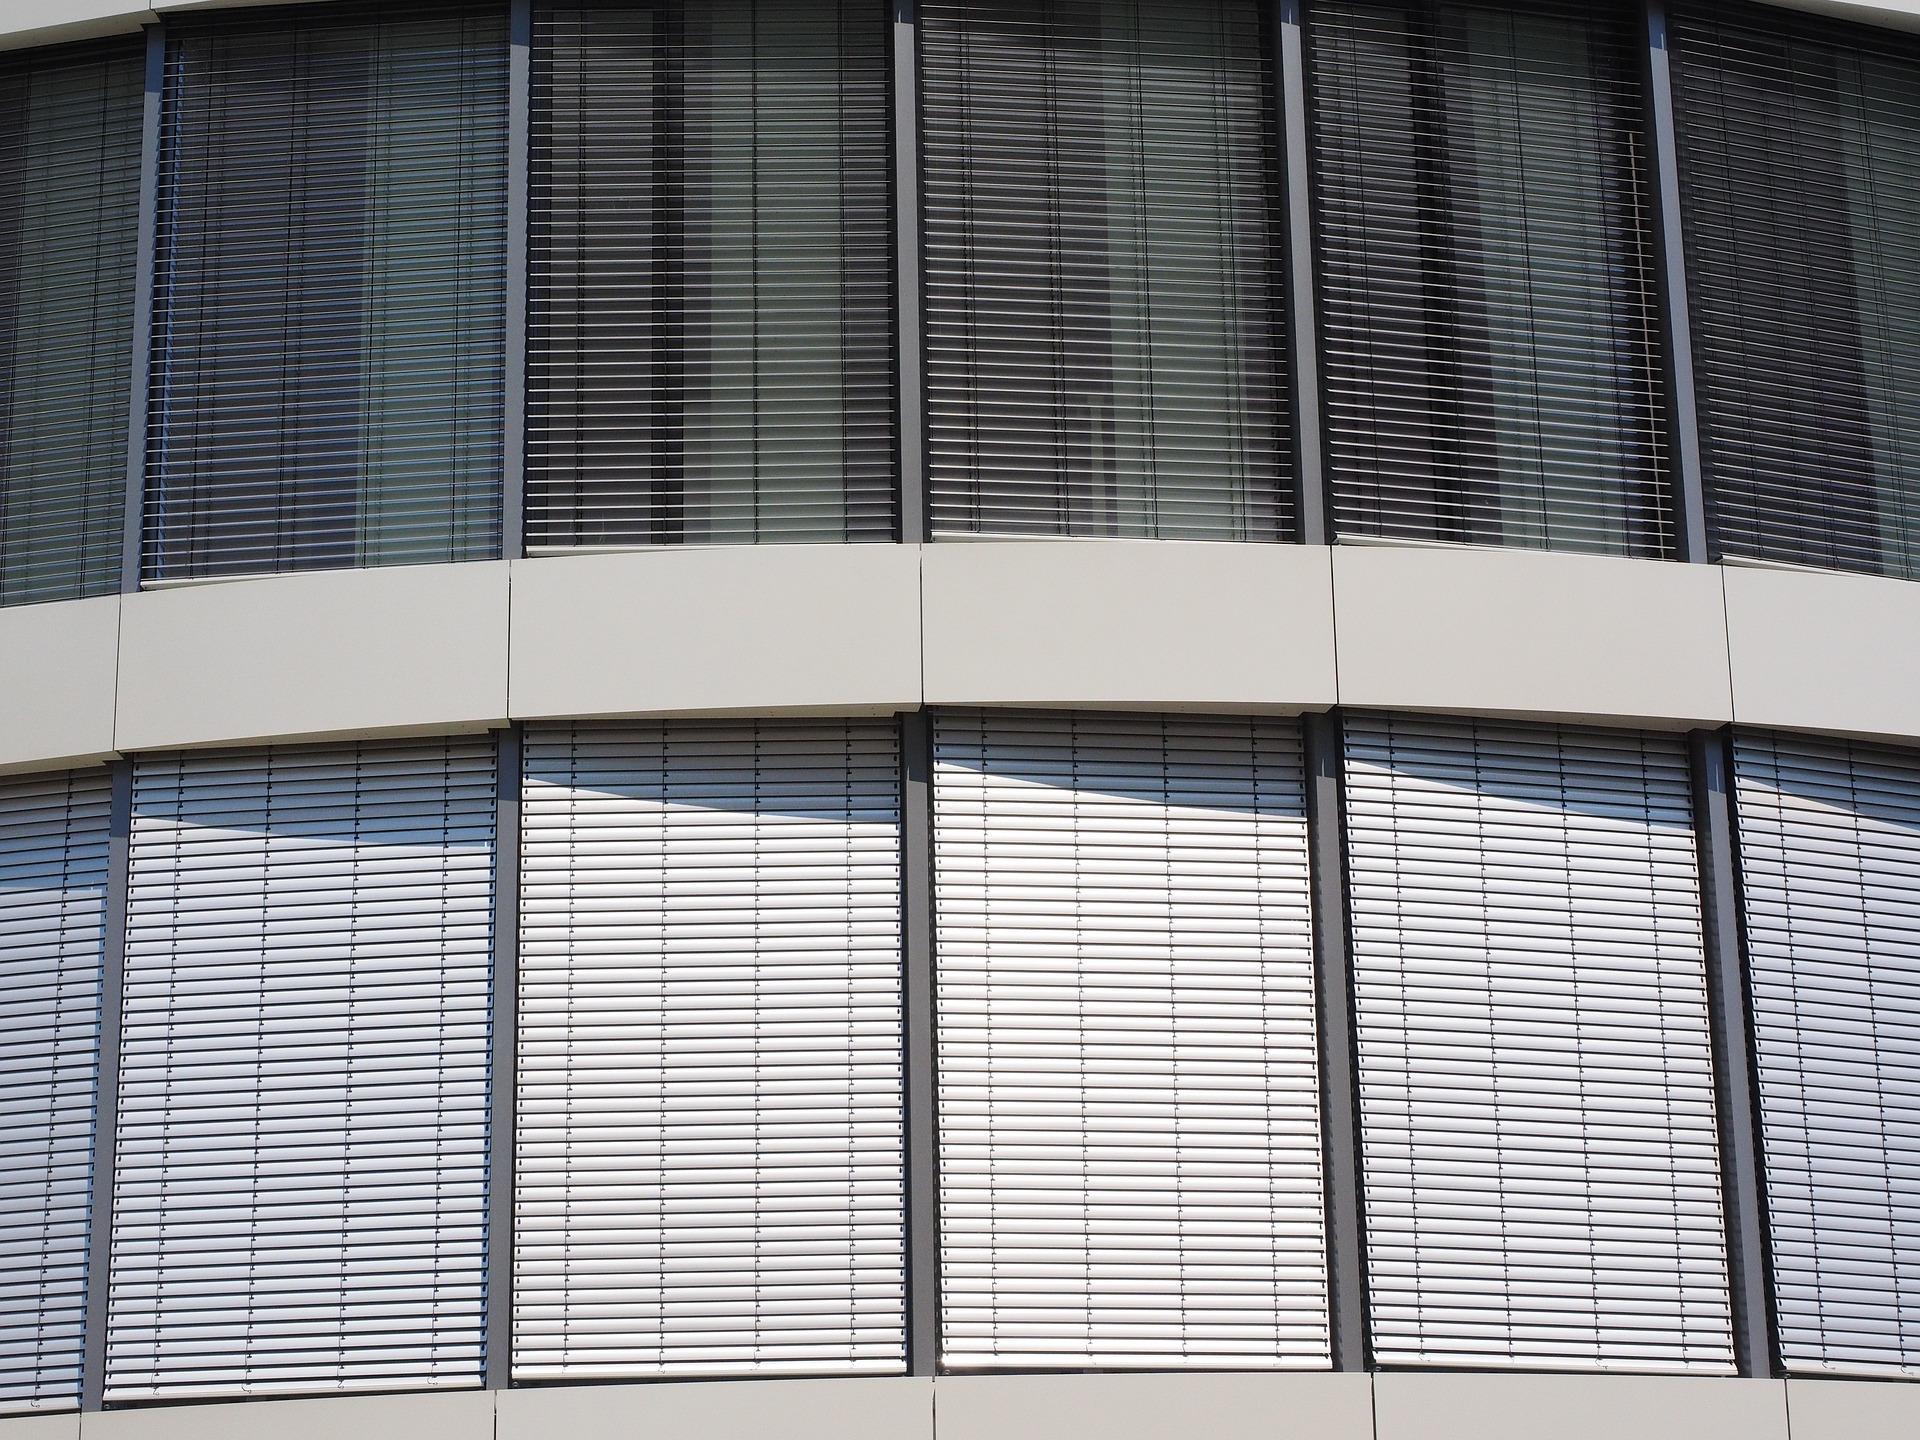 window-2524143_1920